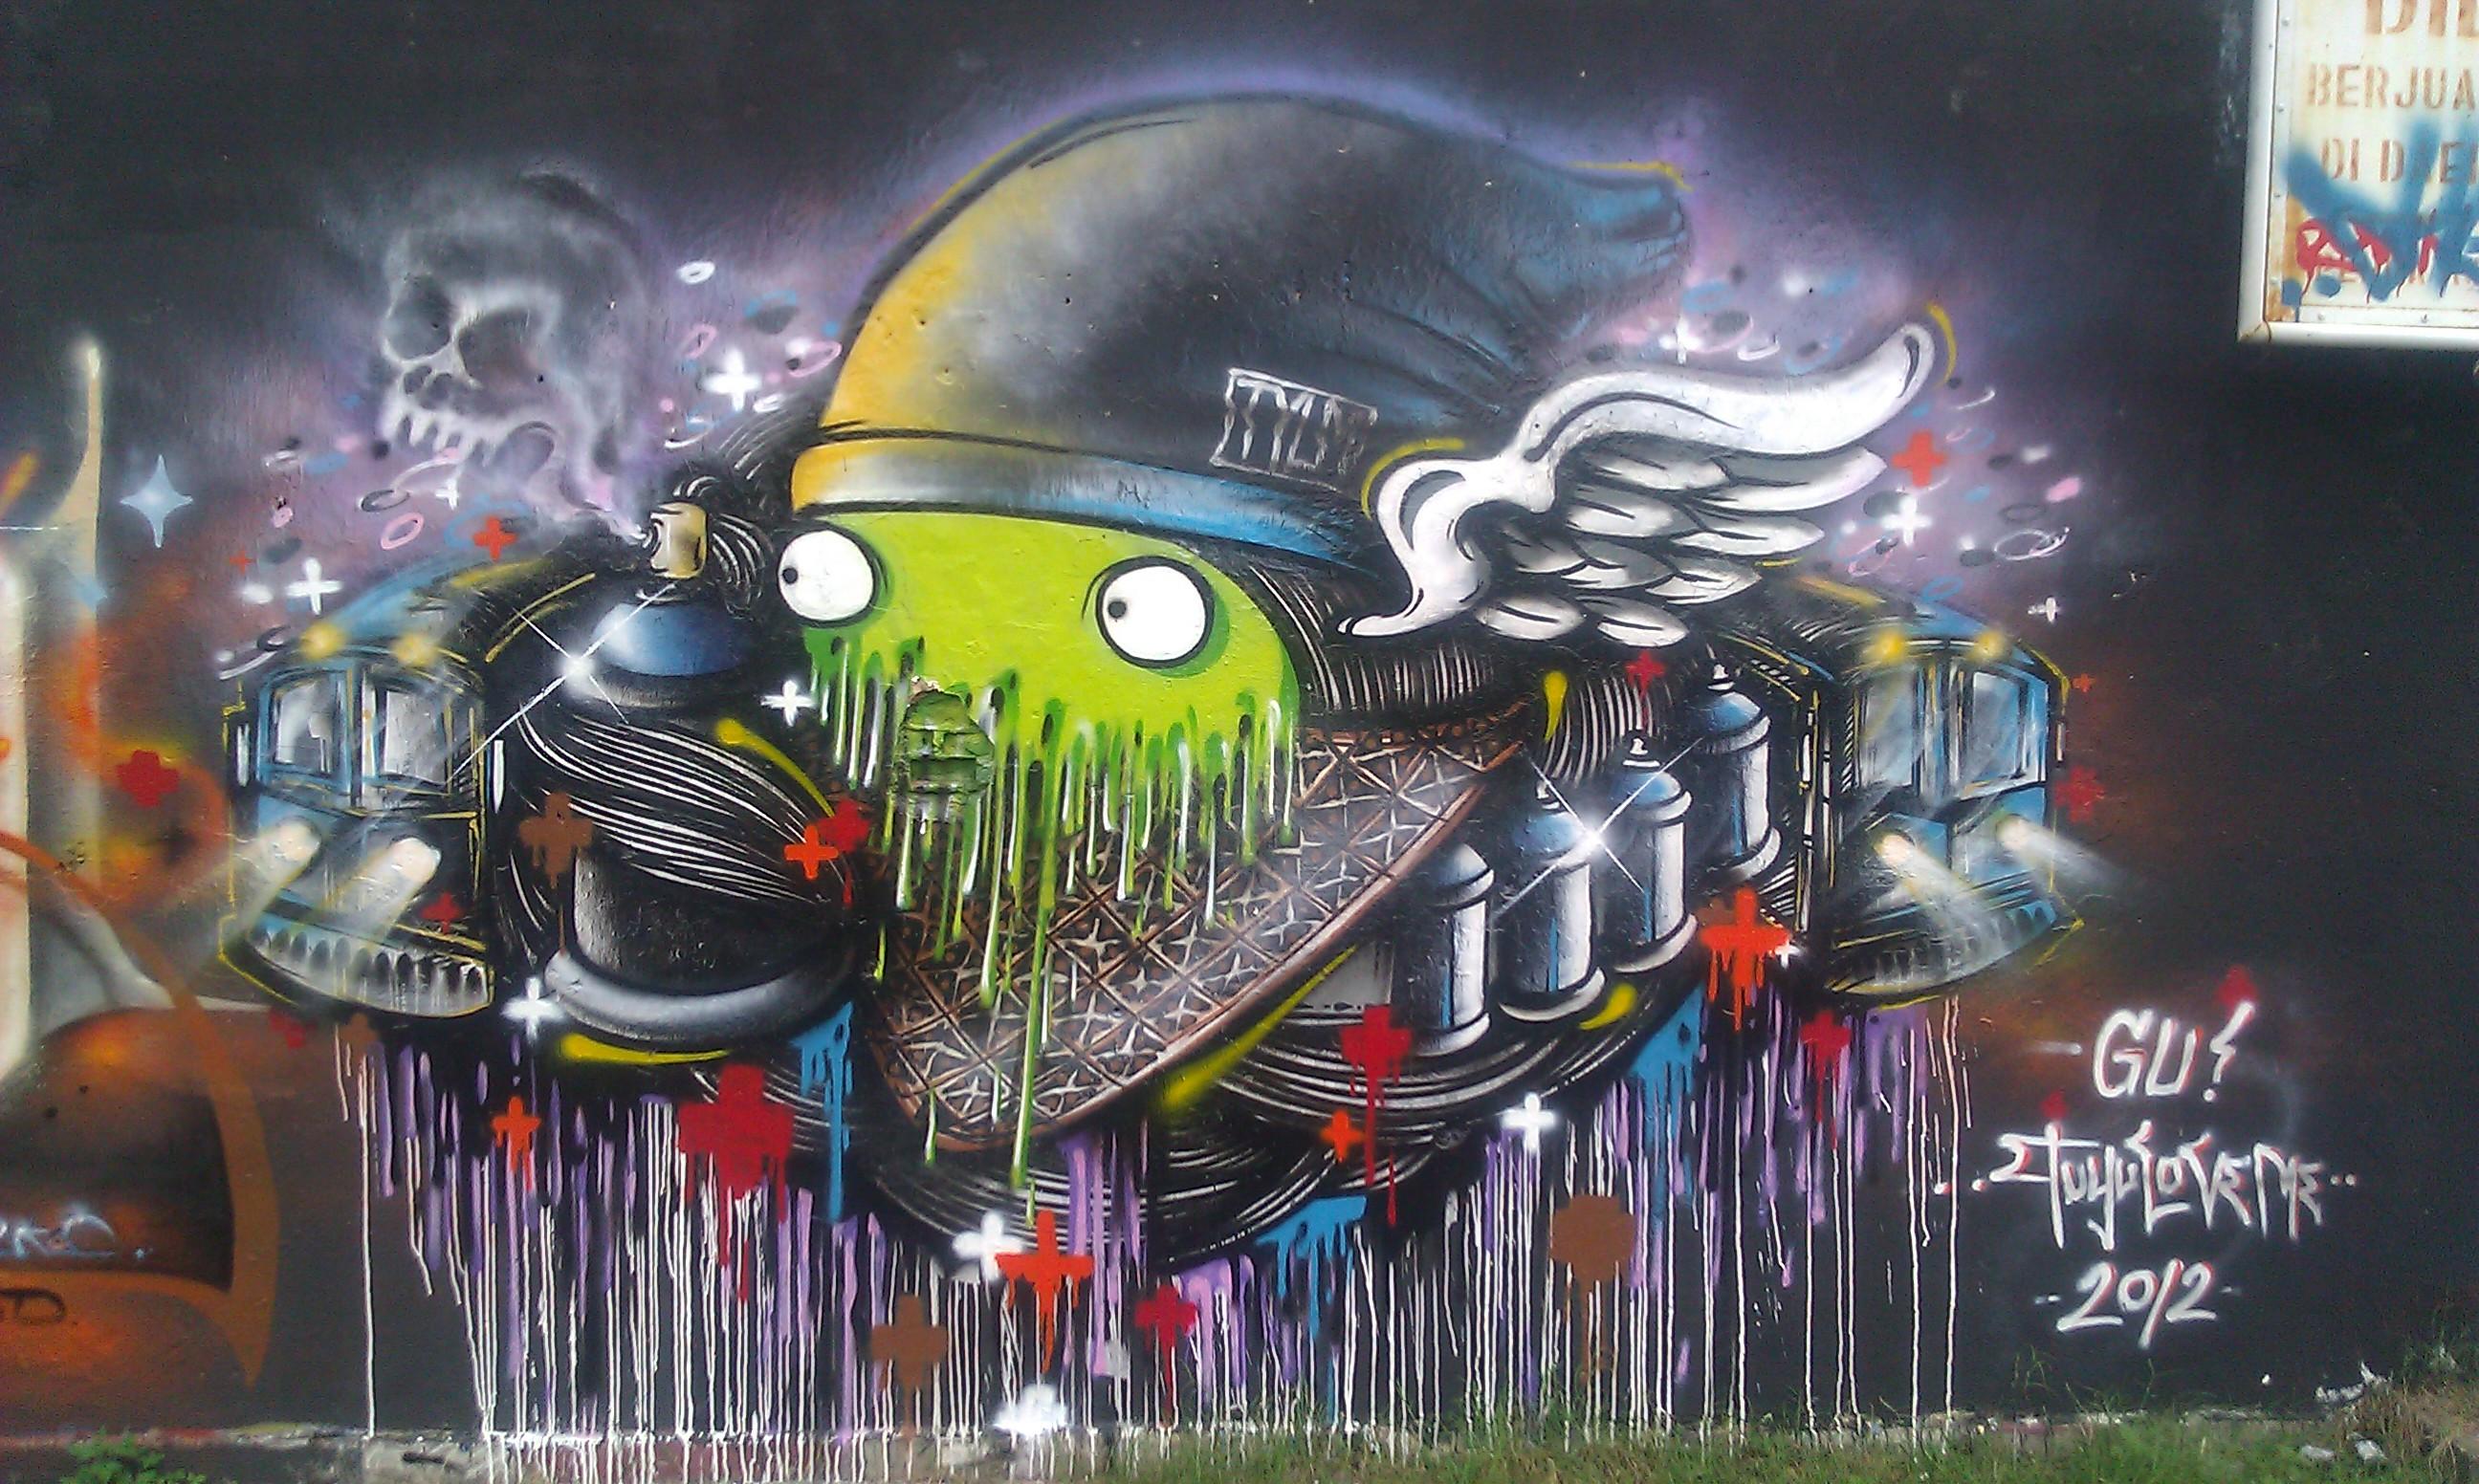 Filegraffiti in yogyakarta indonesia feb 2012 08 jpg